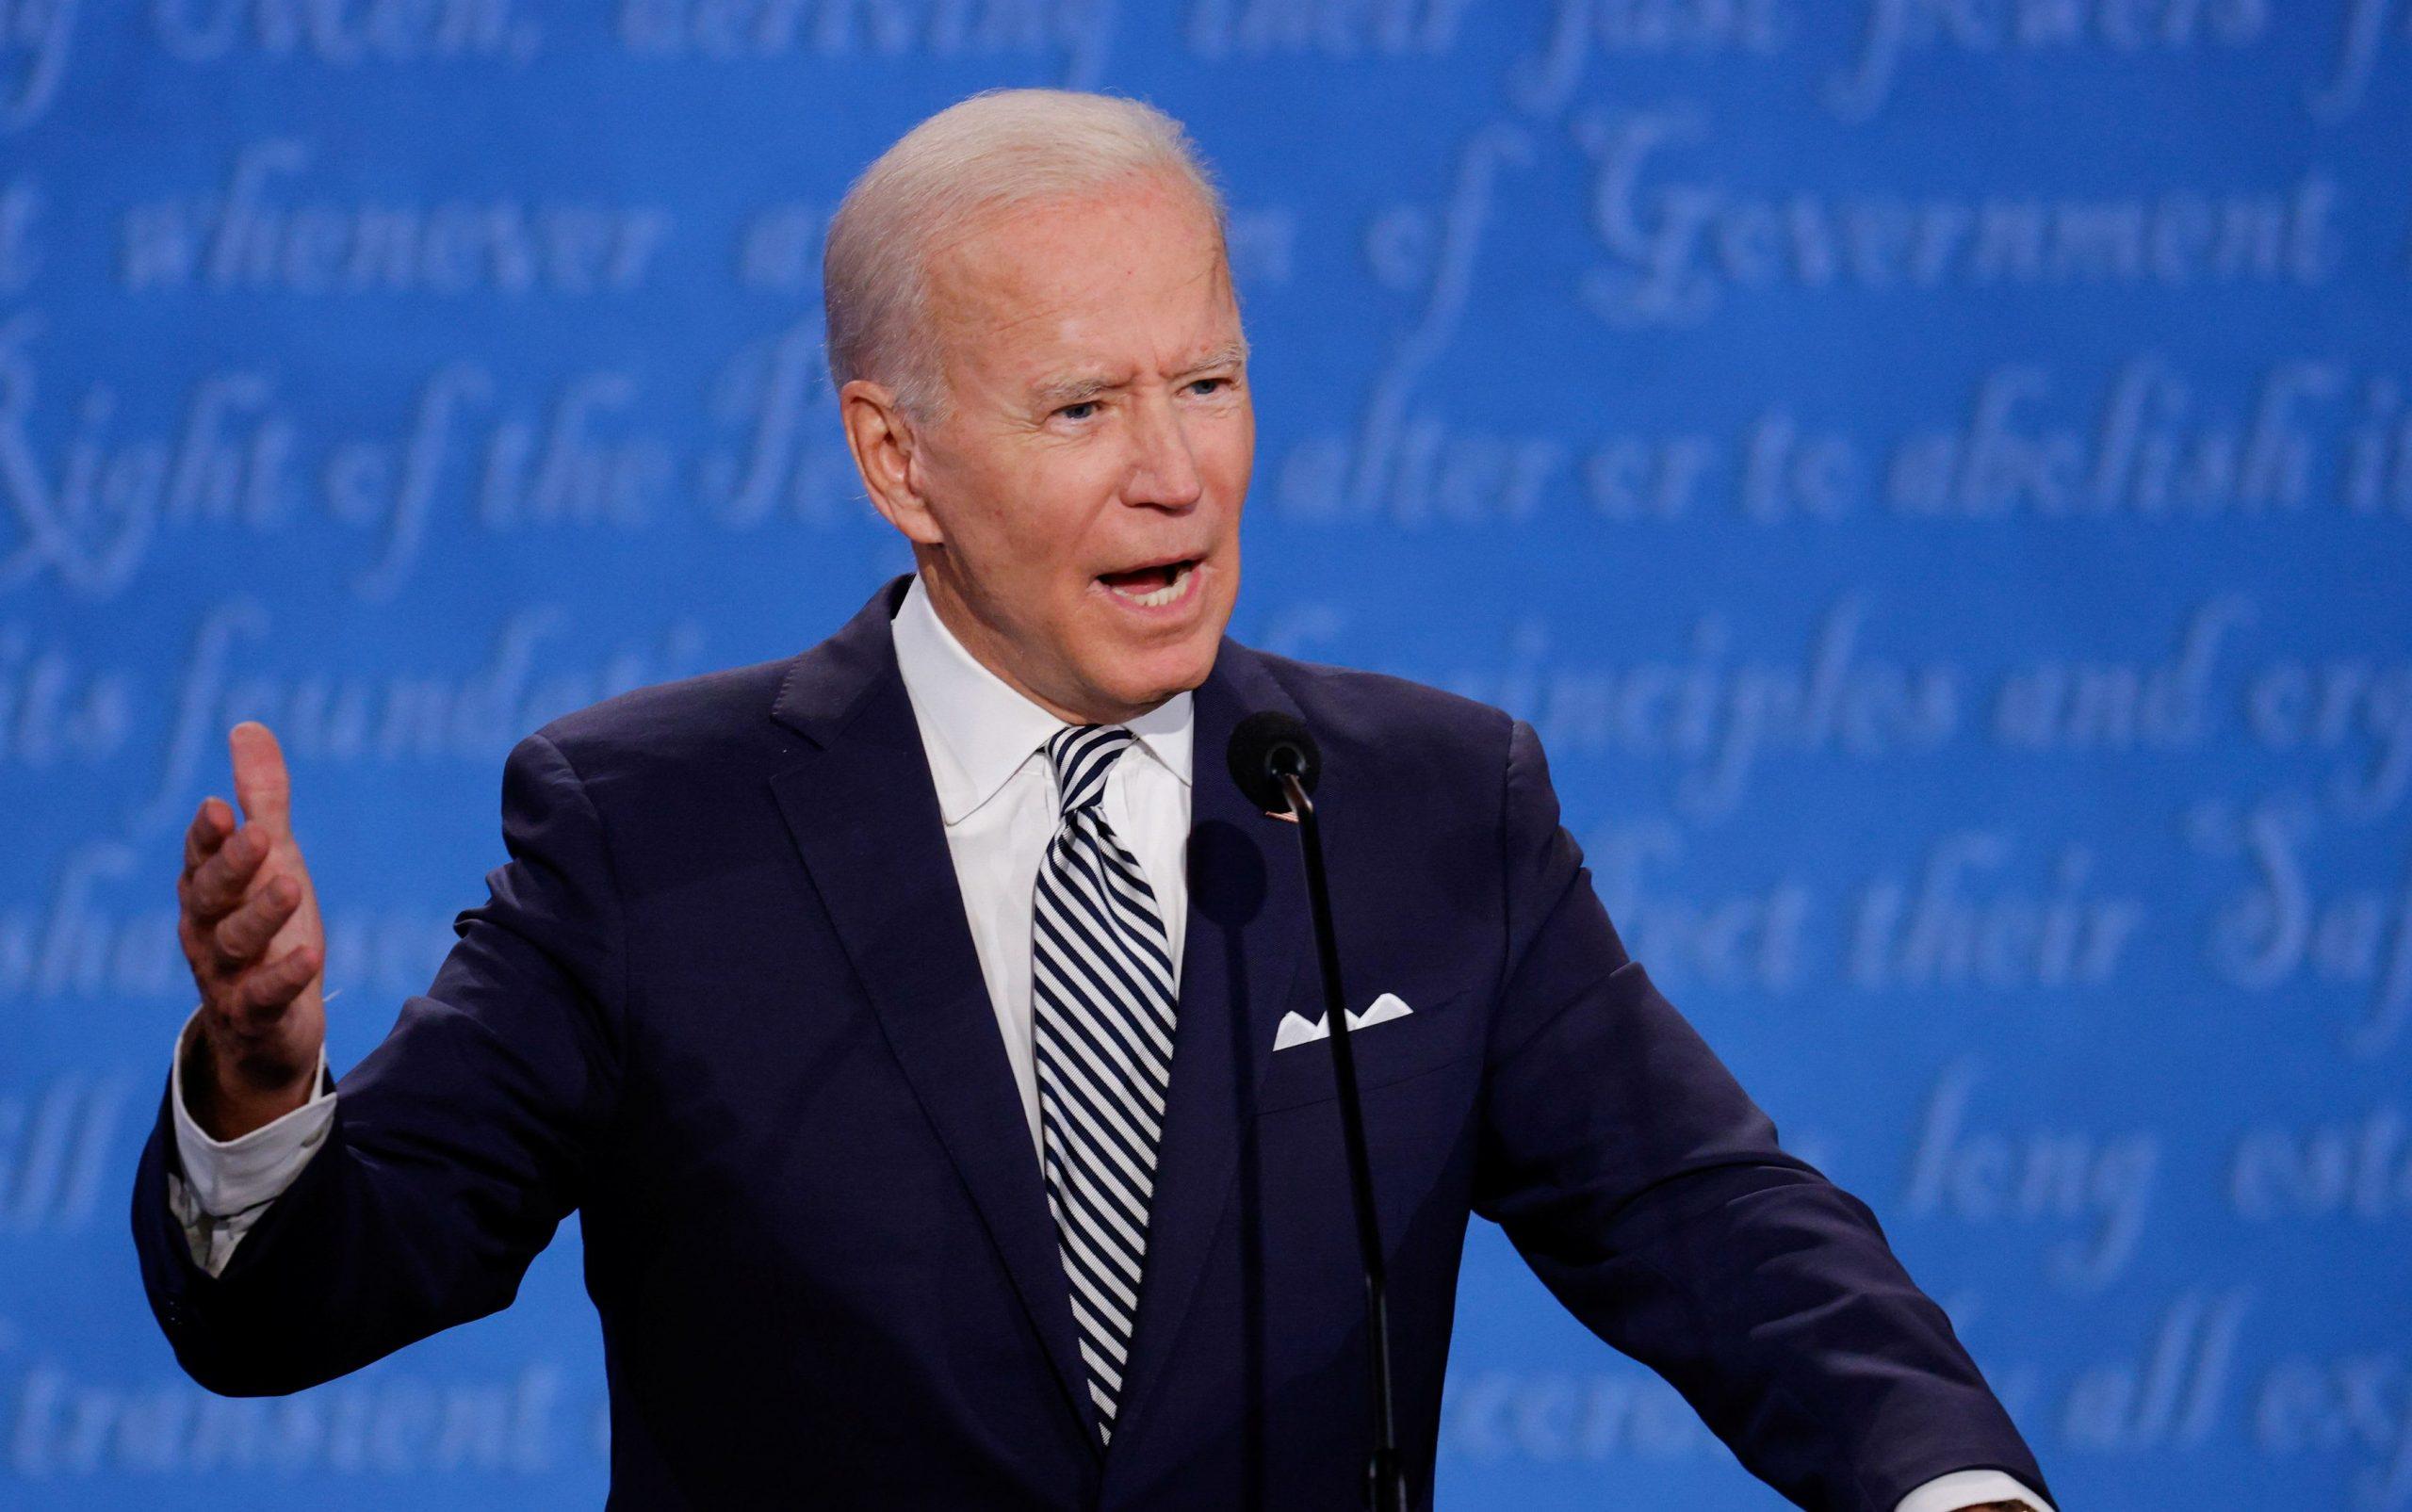 https://www.shutterstock.com/image-photo/democratic-presidential-nominee-joe-biden-participates-1829226137